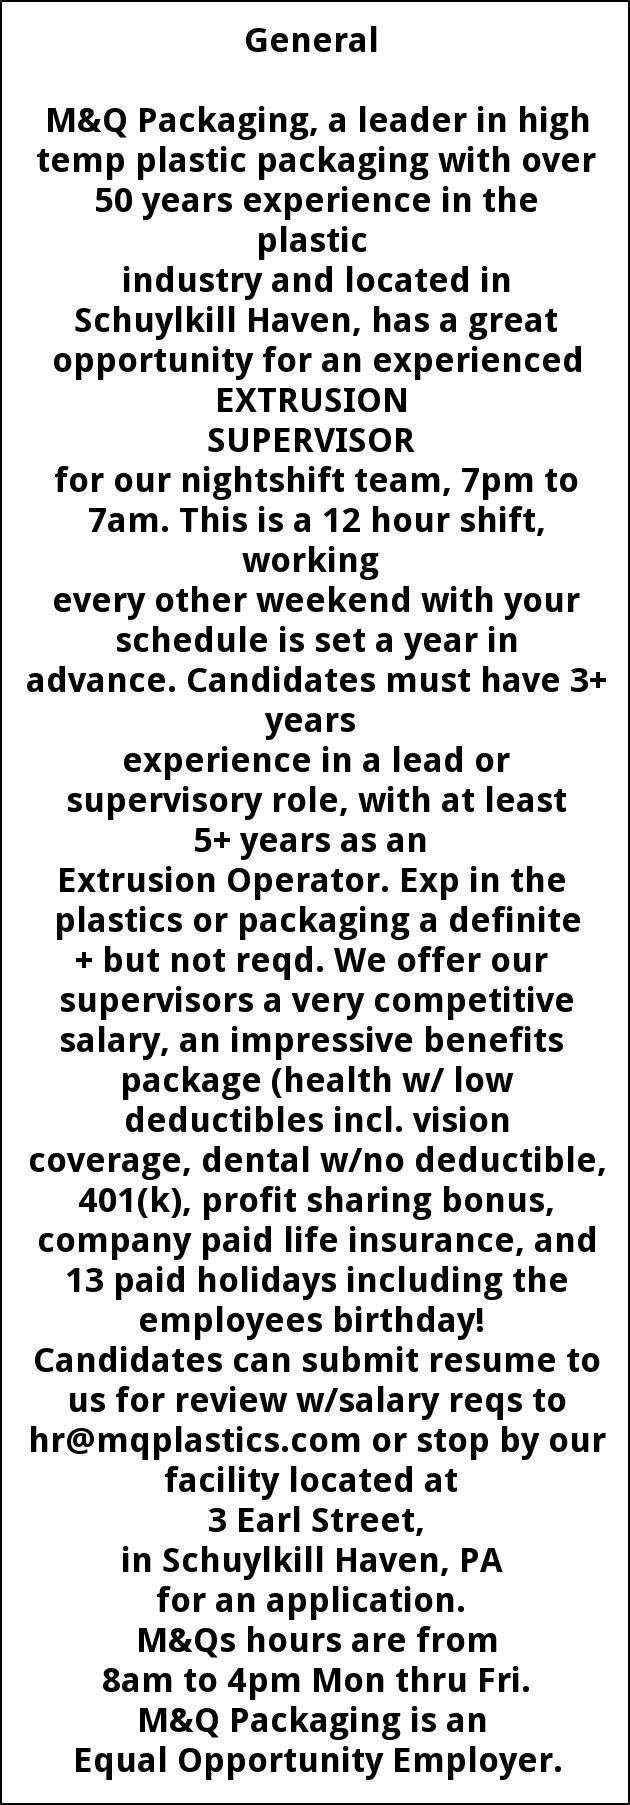 EXTRUSION SUPERVISOR